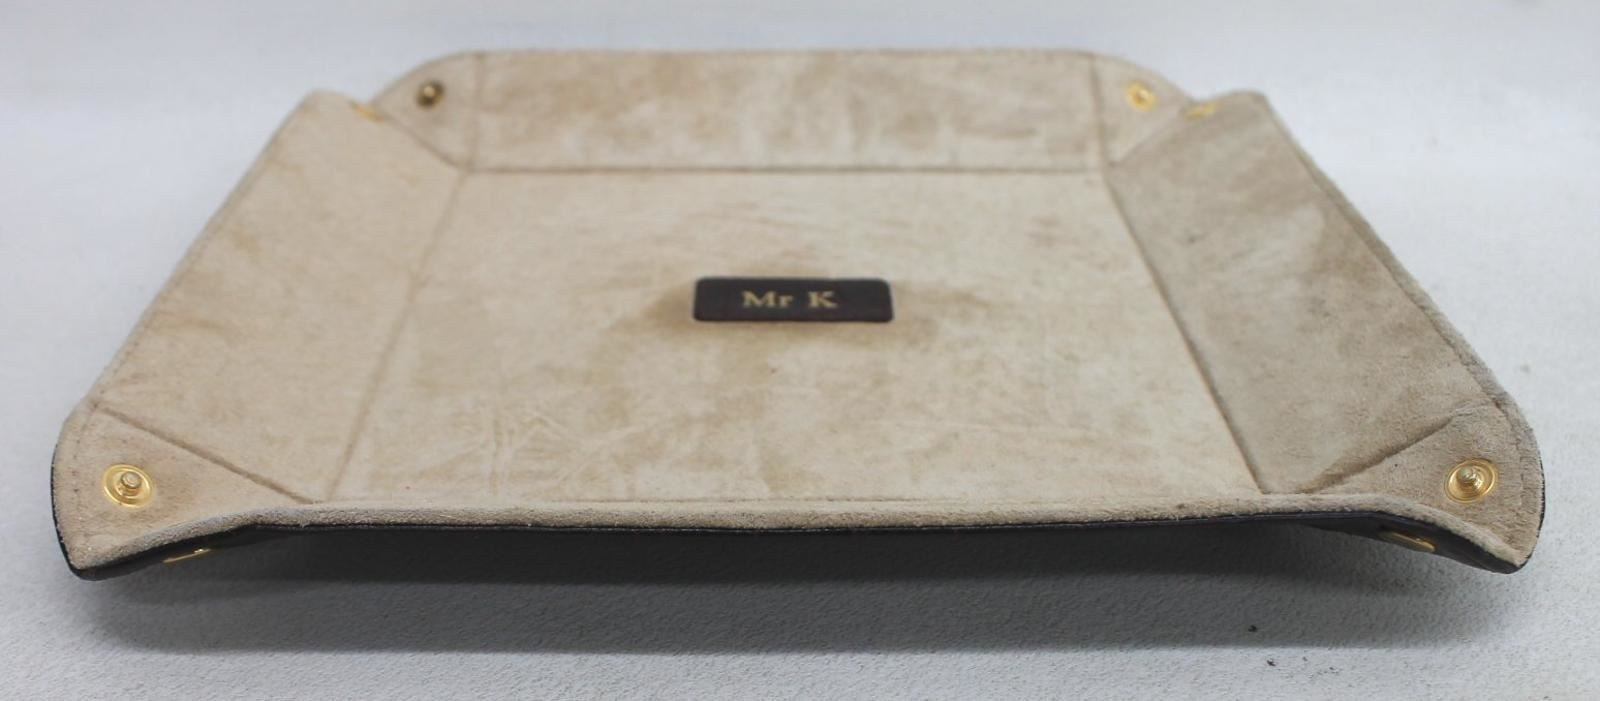 ASPINAL-OF-LONDON-Mahogany-Croc-Print-Leather-Medium-Tidy-Tray-Embossed-Mr-K-NEW